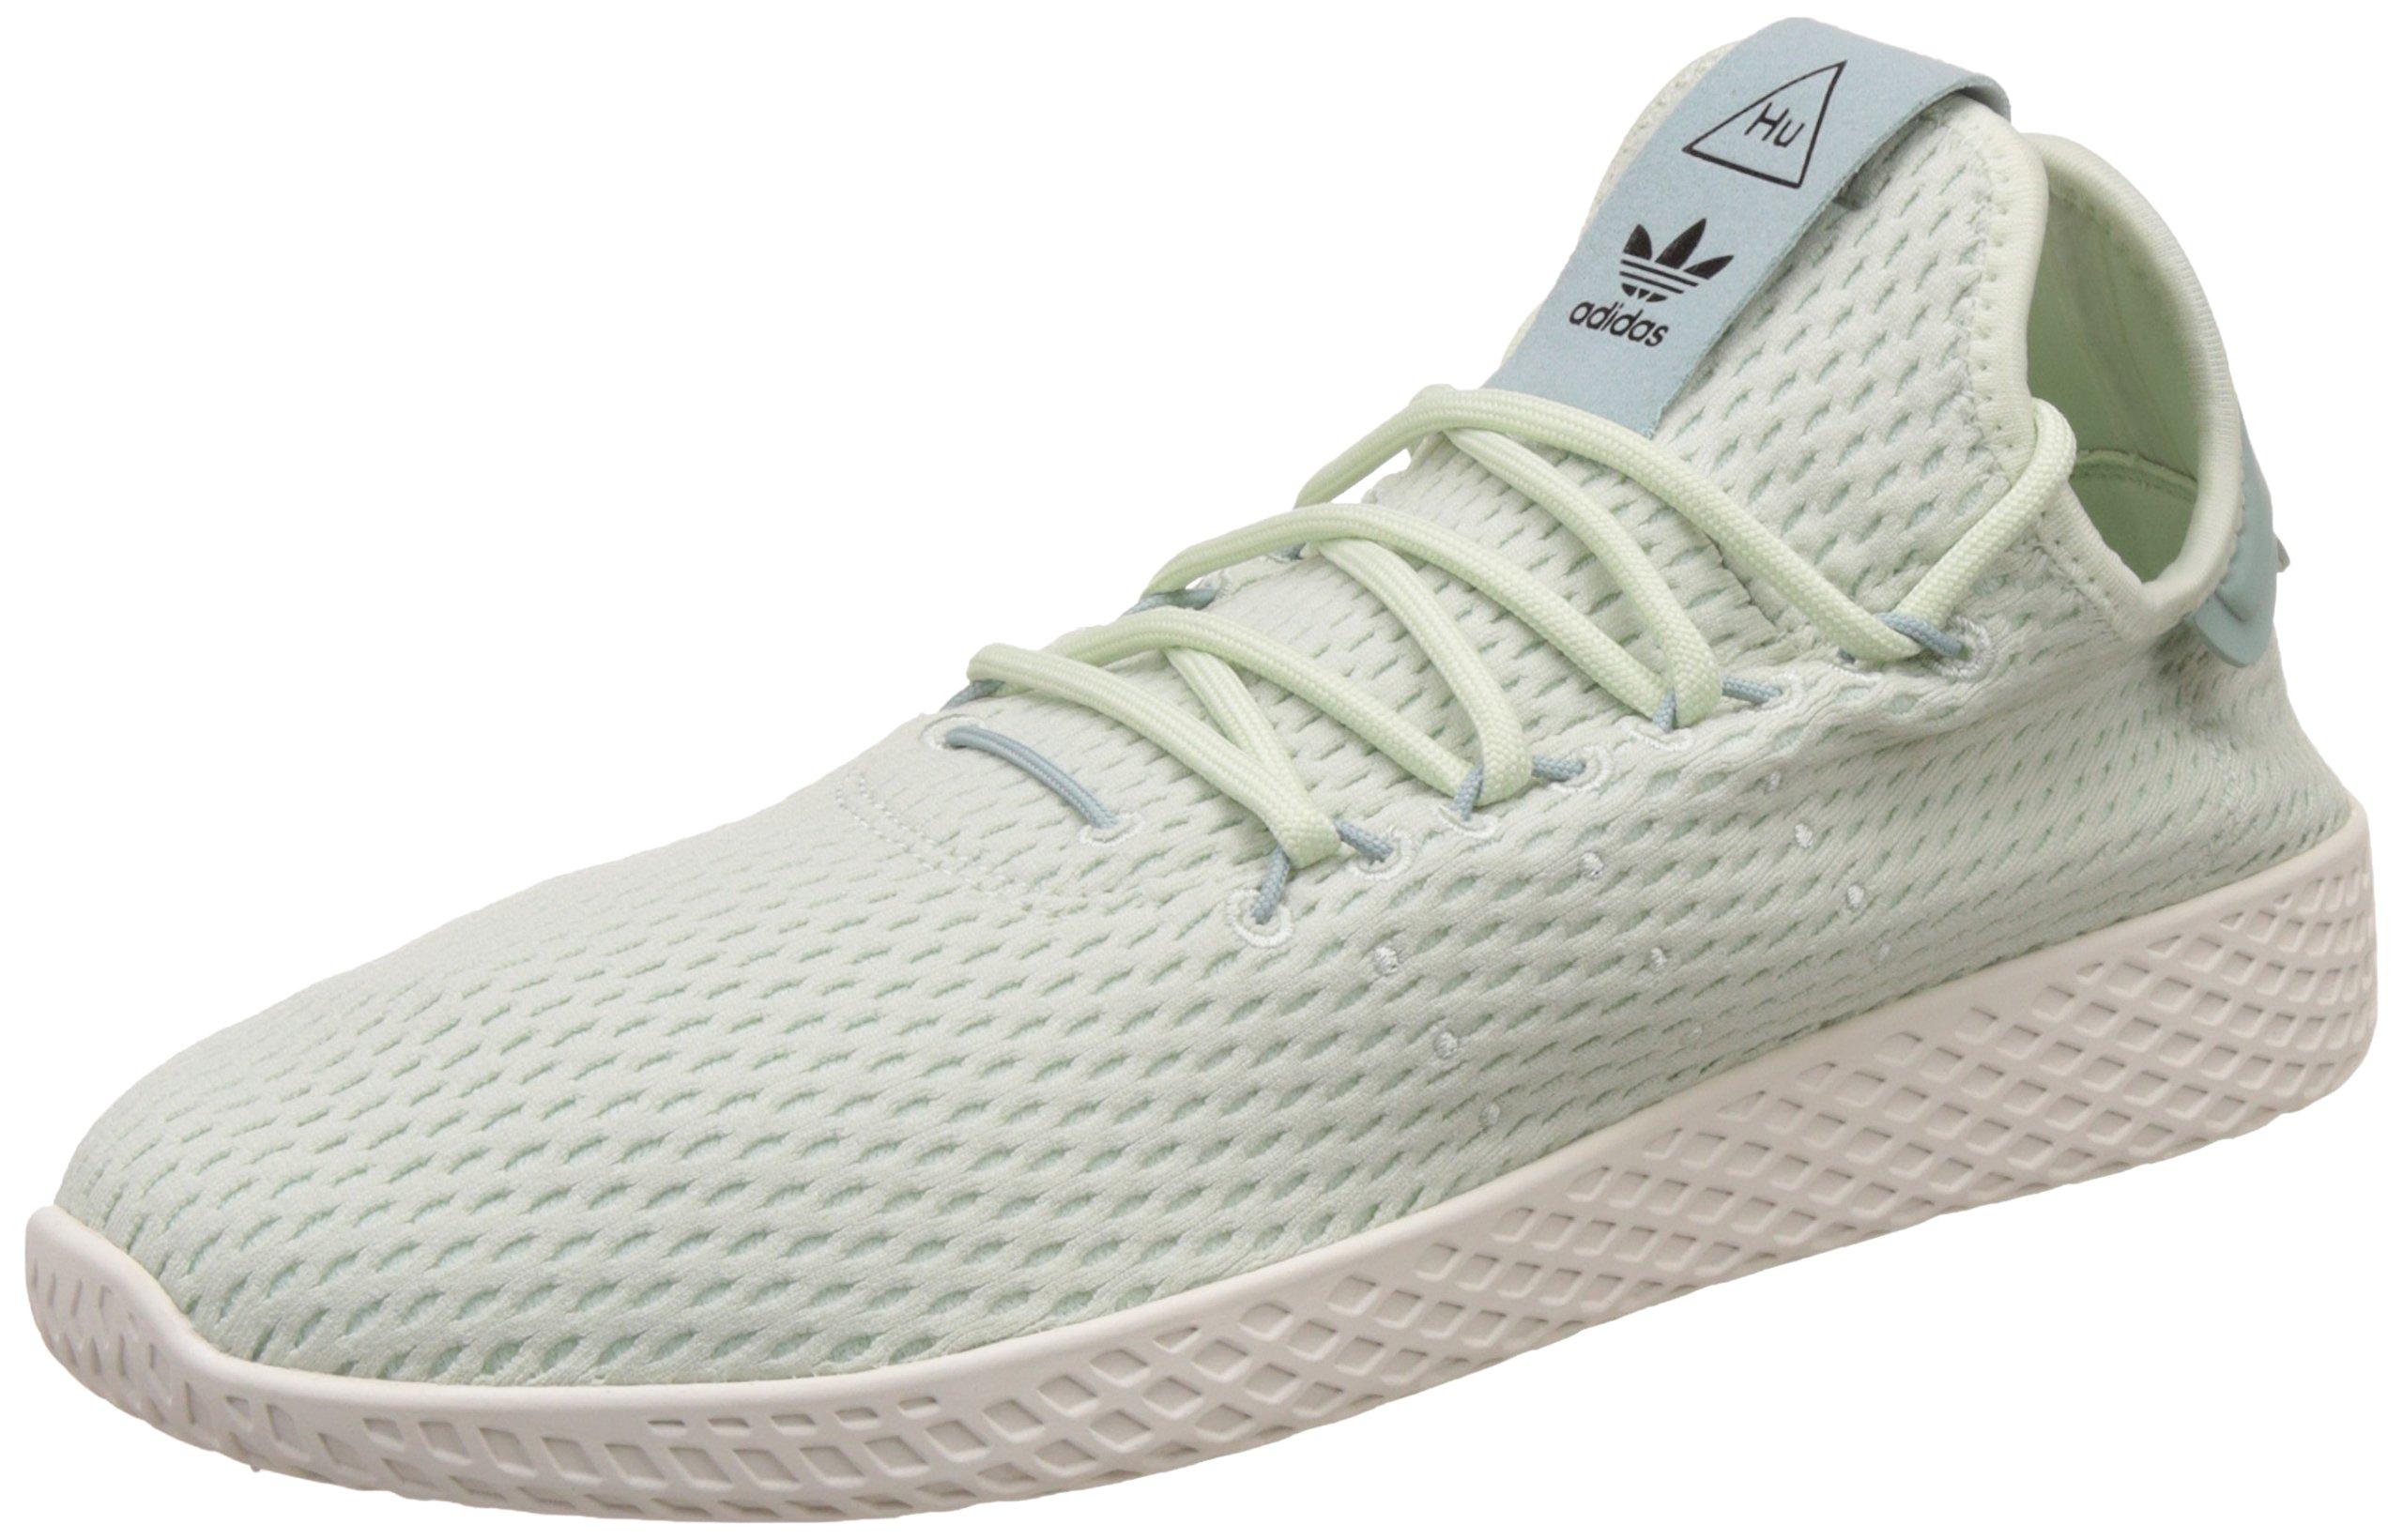 adidas Originals PW Tennis HU Mens Trainers Sneakers (UK 3.5 US 4 EU 36, Linen Green CP9765)